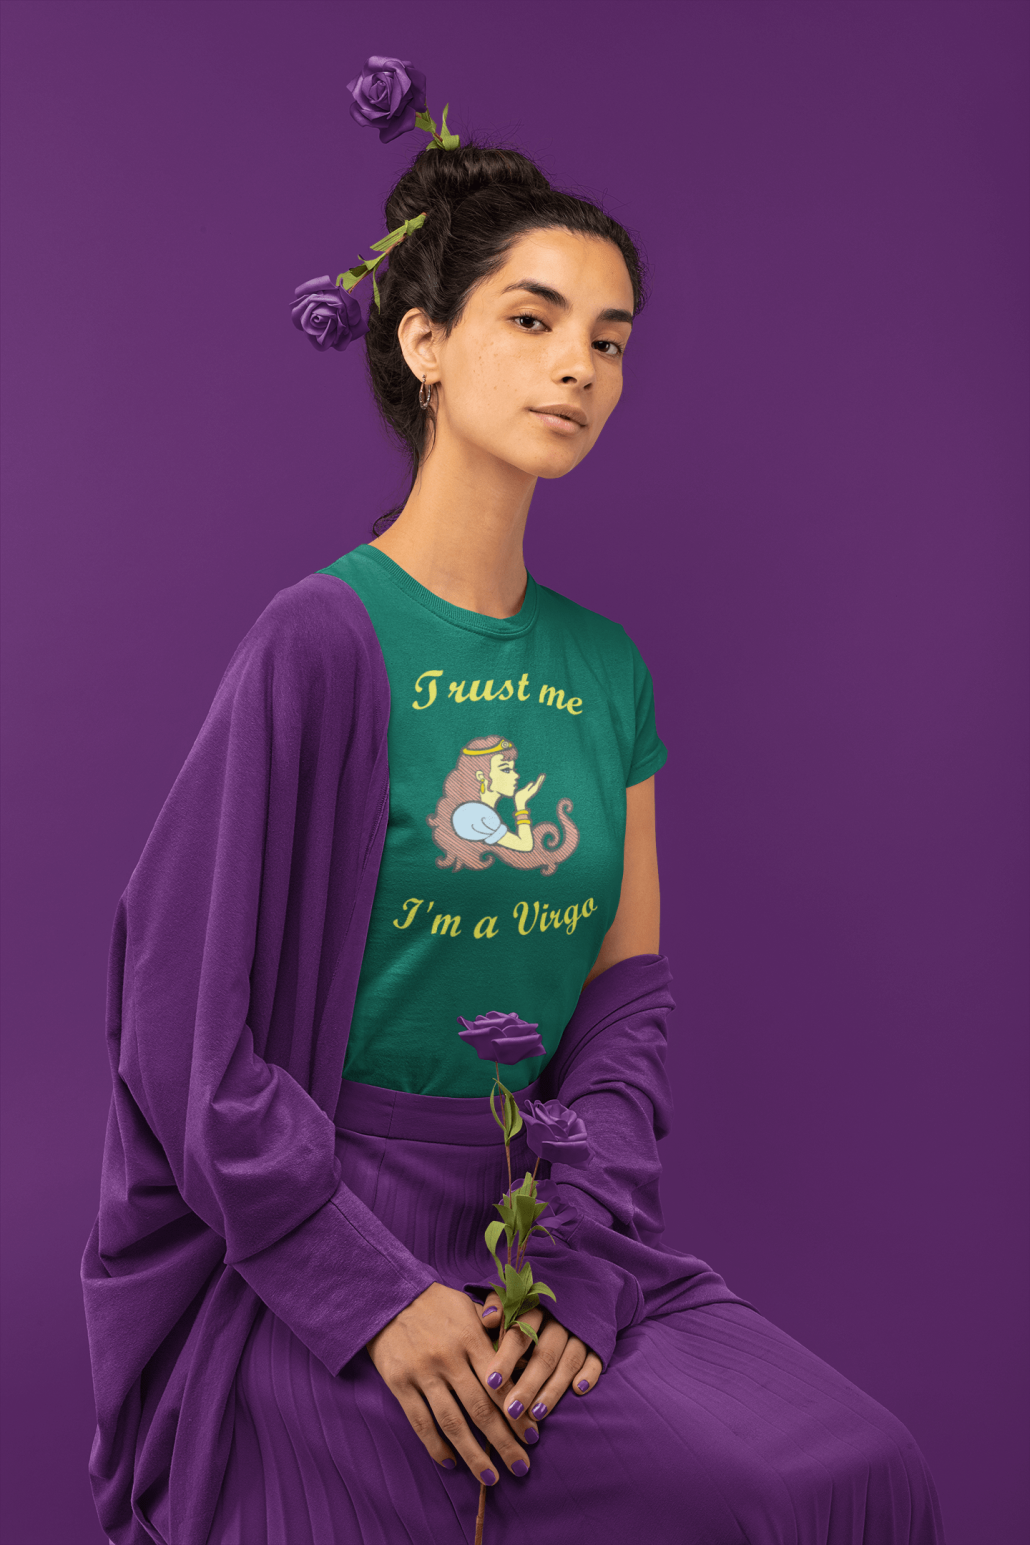 Girl with custom virgo shirt